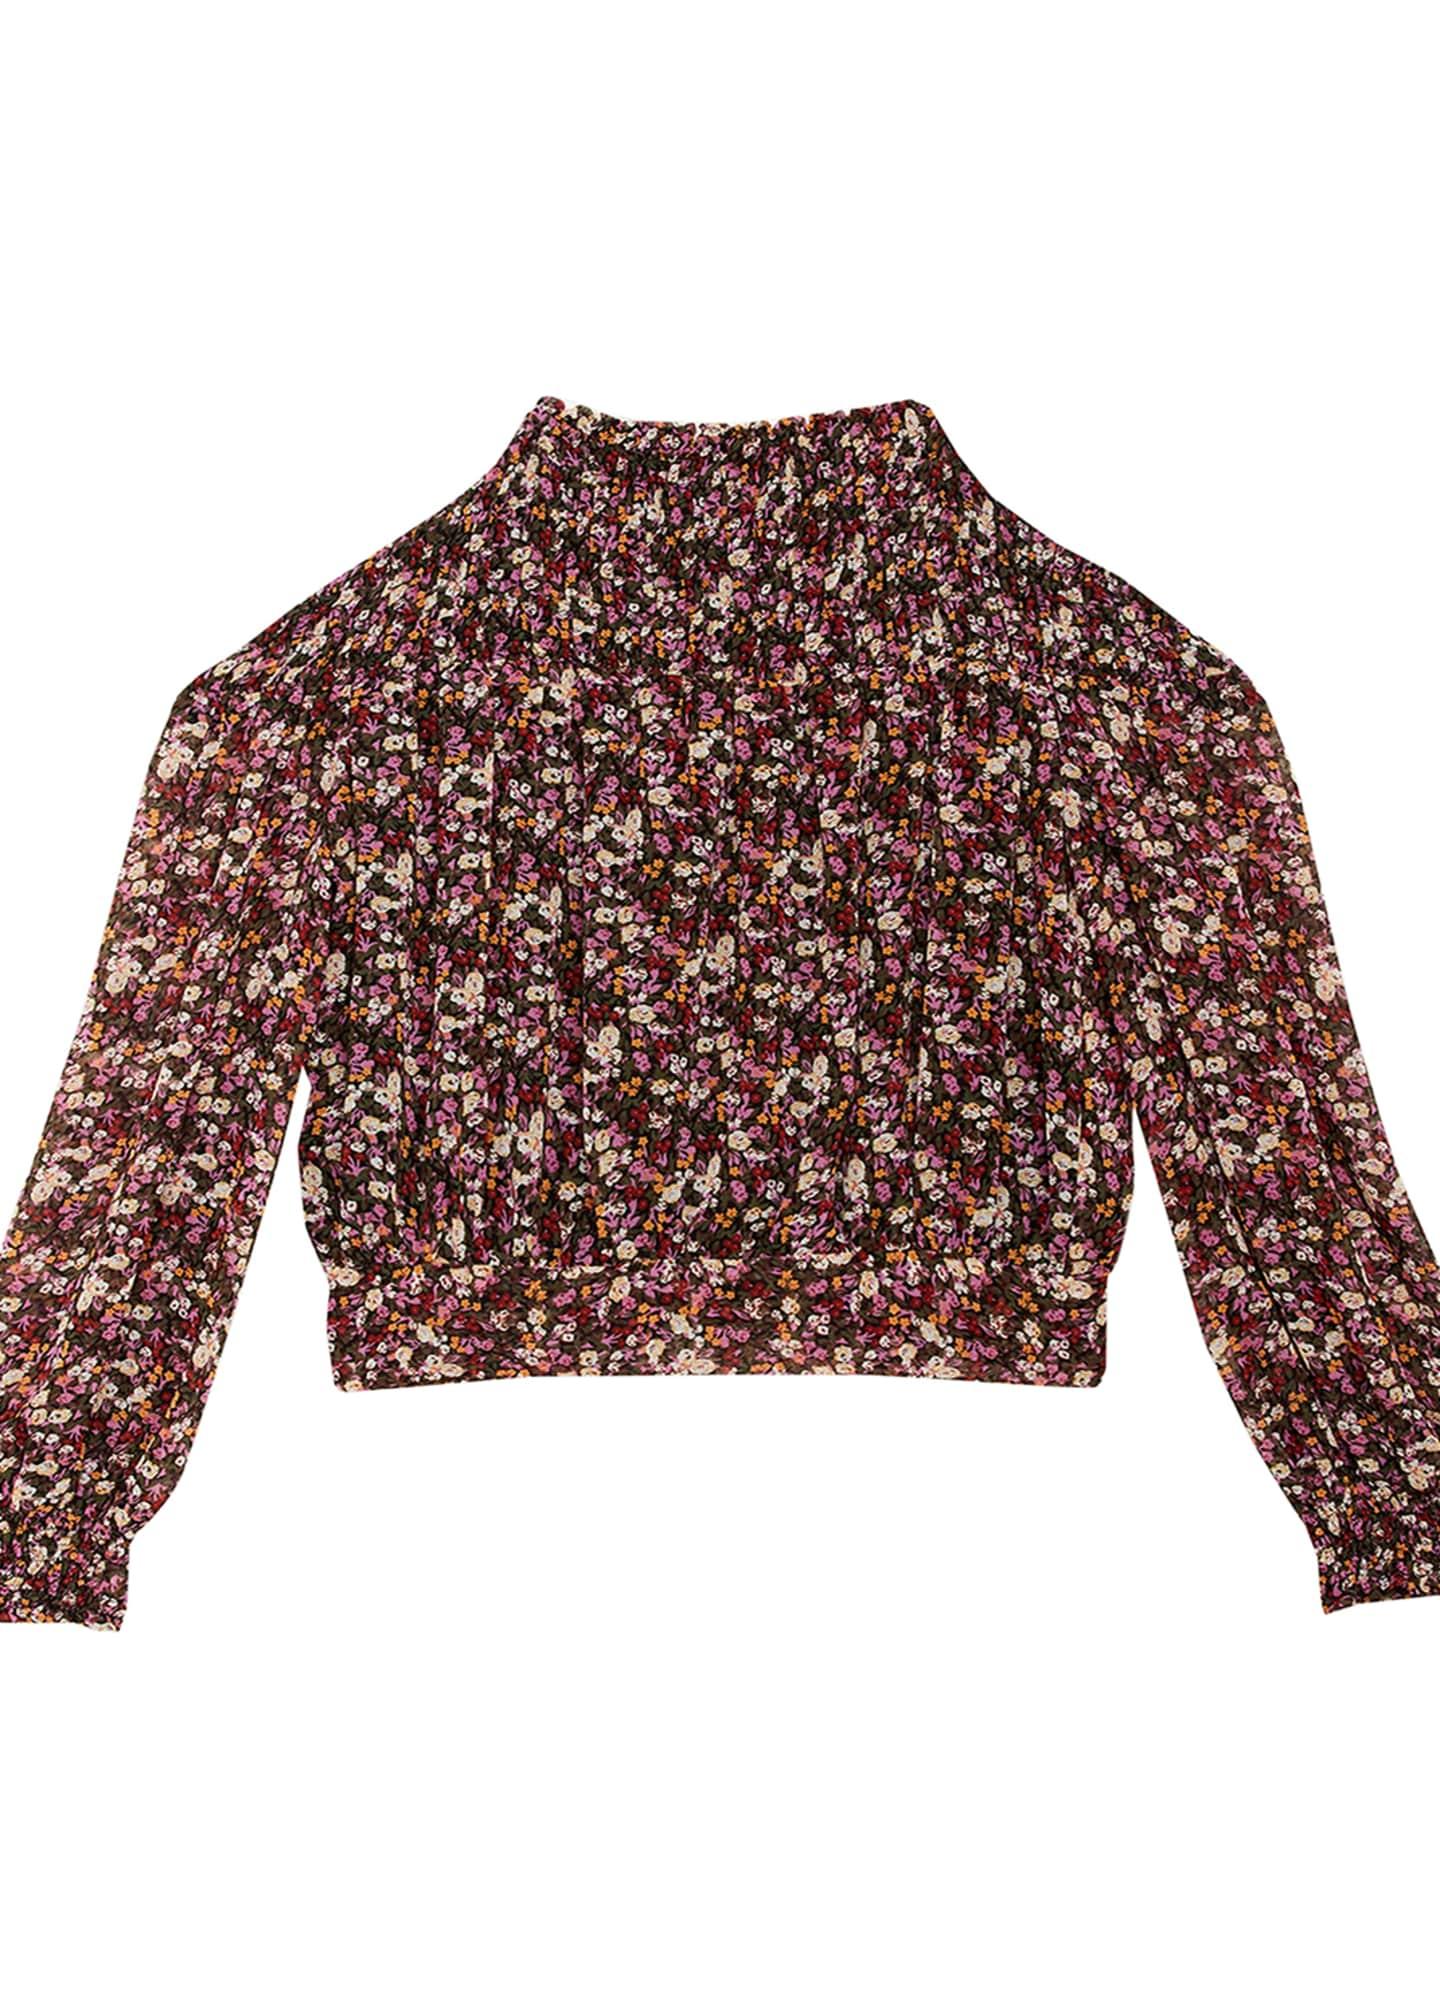 Bardot Junior Girl's Grace Shirred Floral Print Top,